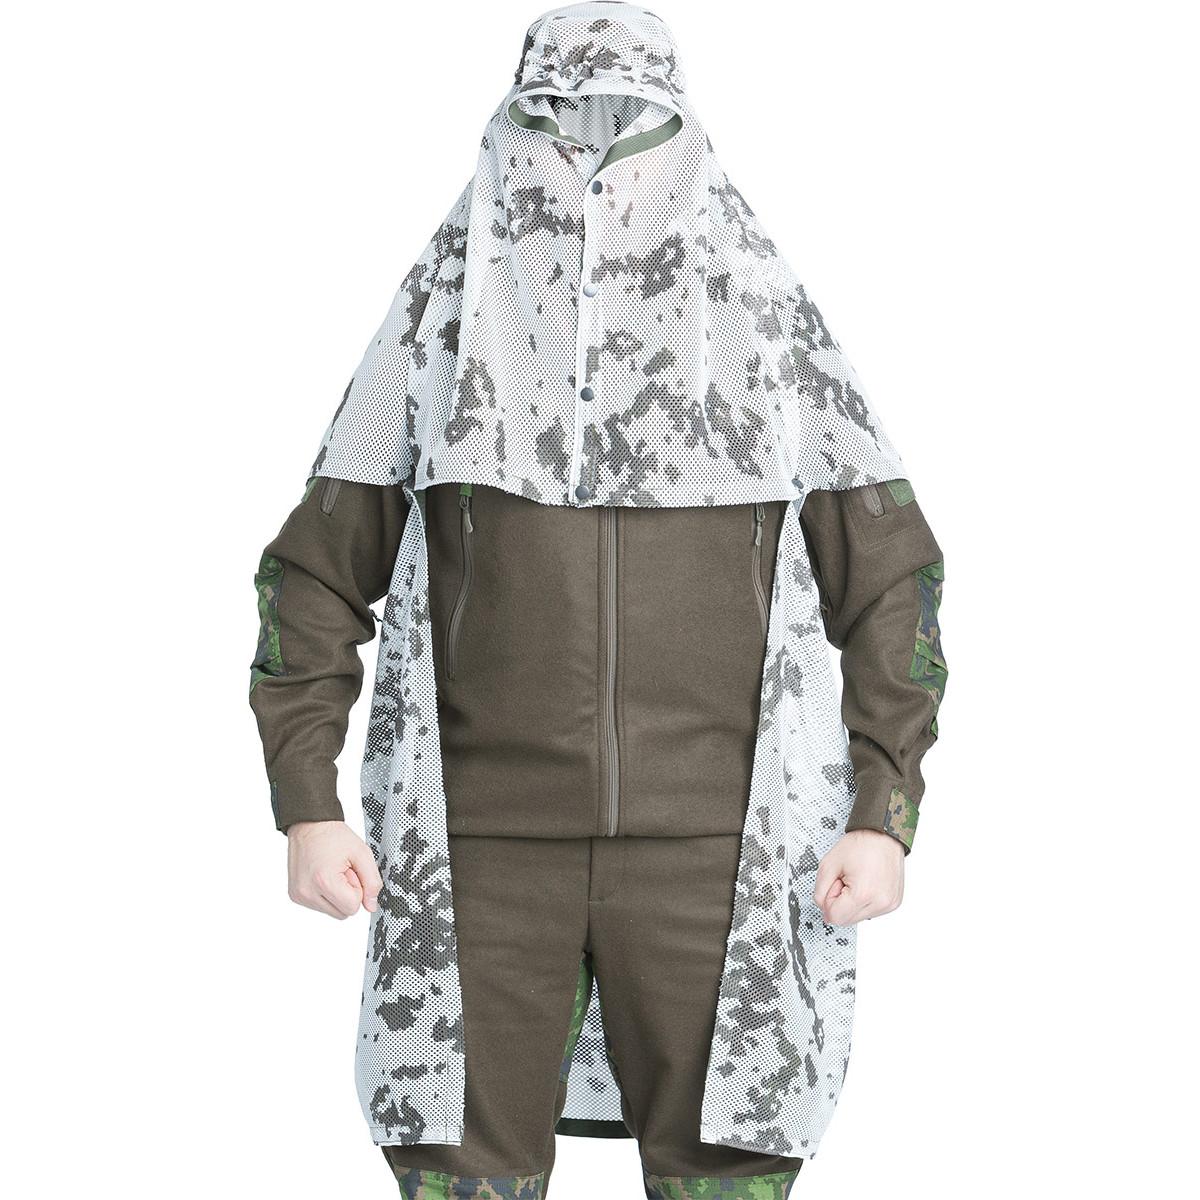 Särmä TST Camouflage cloak - Varusteleka.com 3327b8f59a